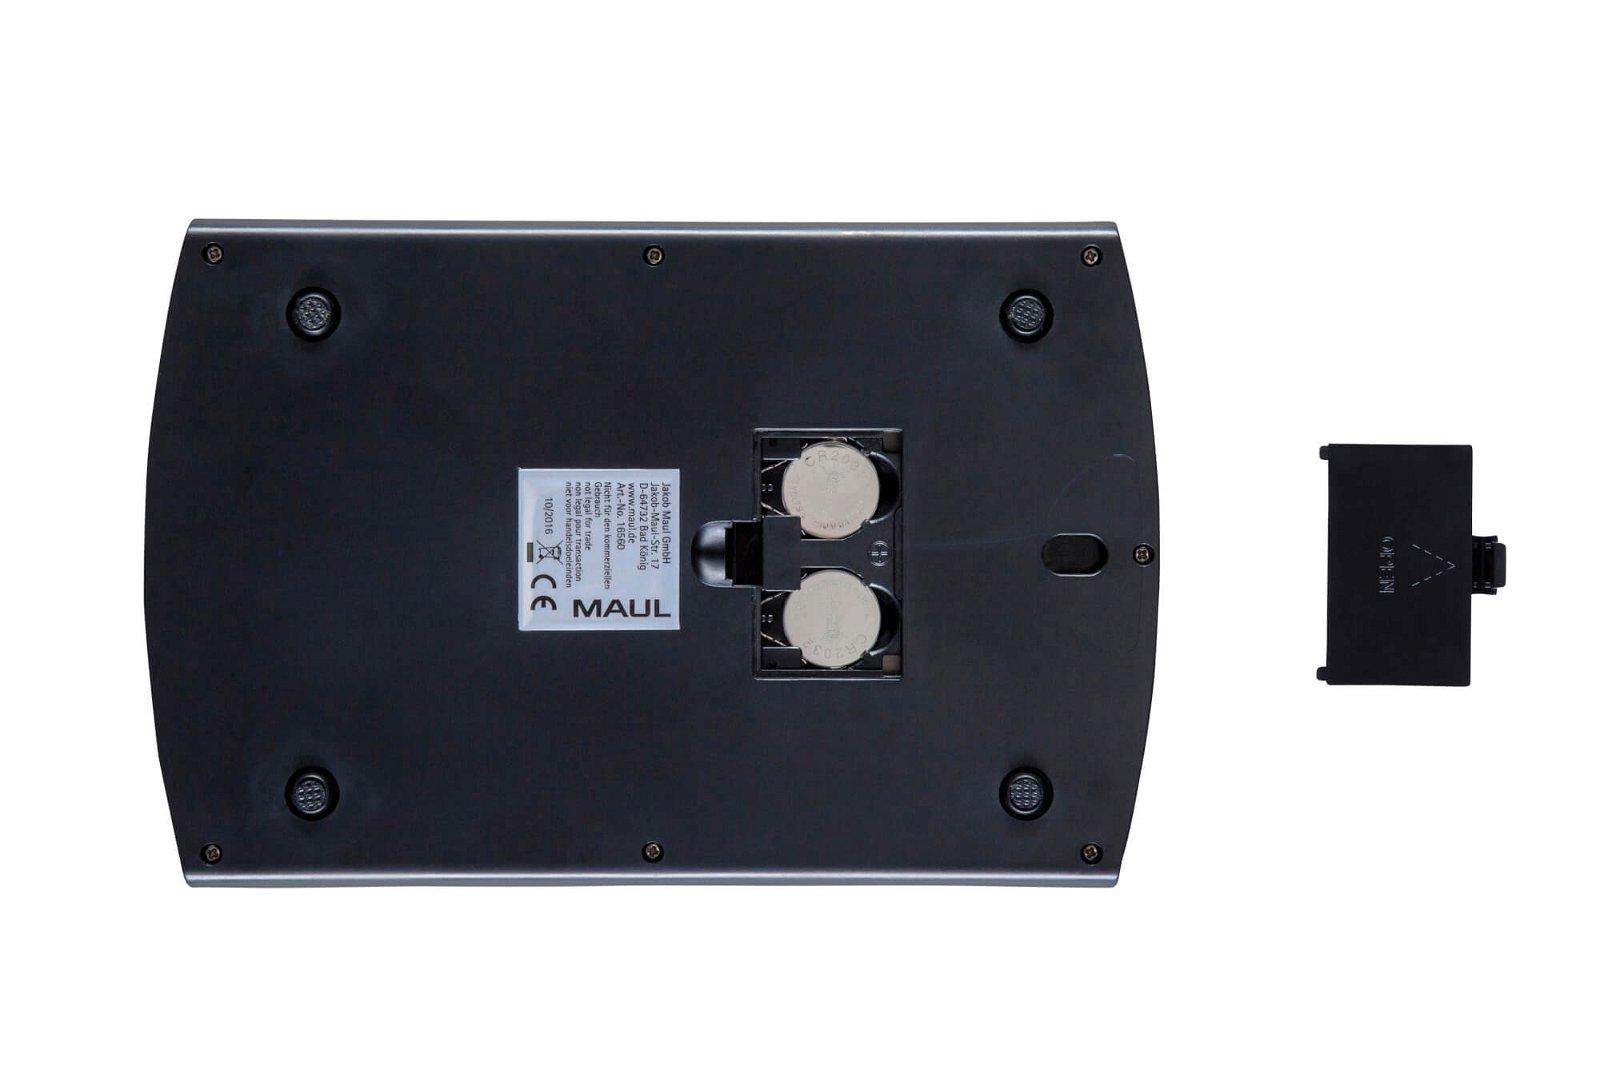 Briefwaage MAULsteel ll mit Batterie, 5000 g, hellsilber